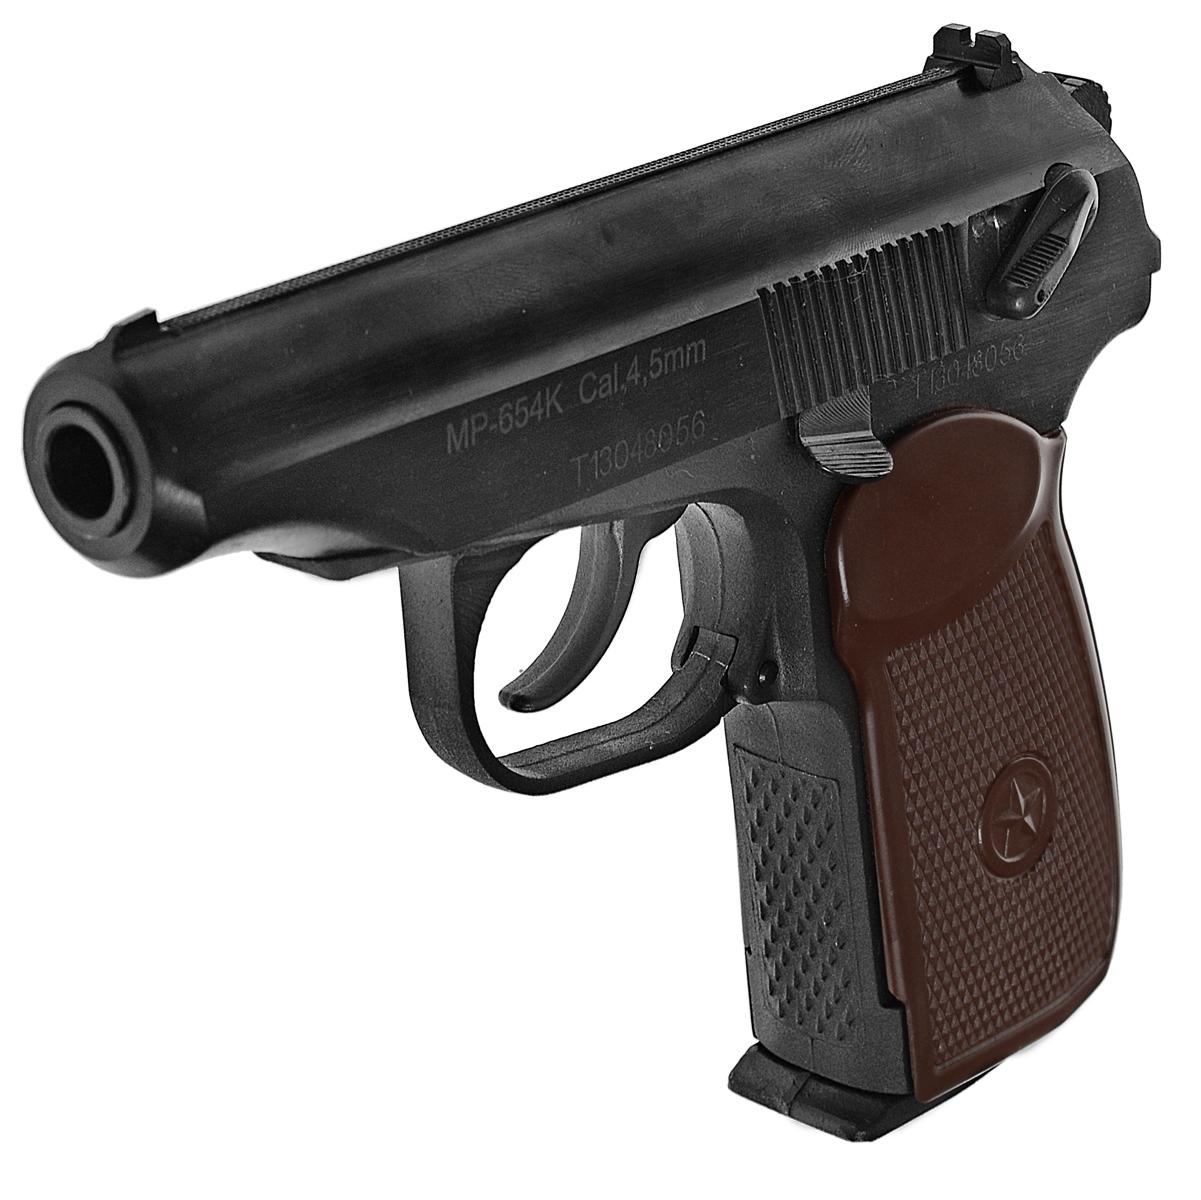 Байкал МР-654К-20 пистолет пневматический, NBB, CO2, 4,5 мм